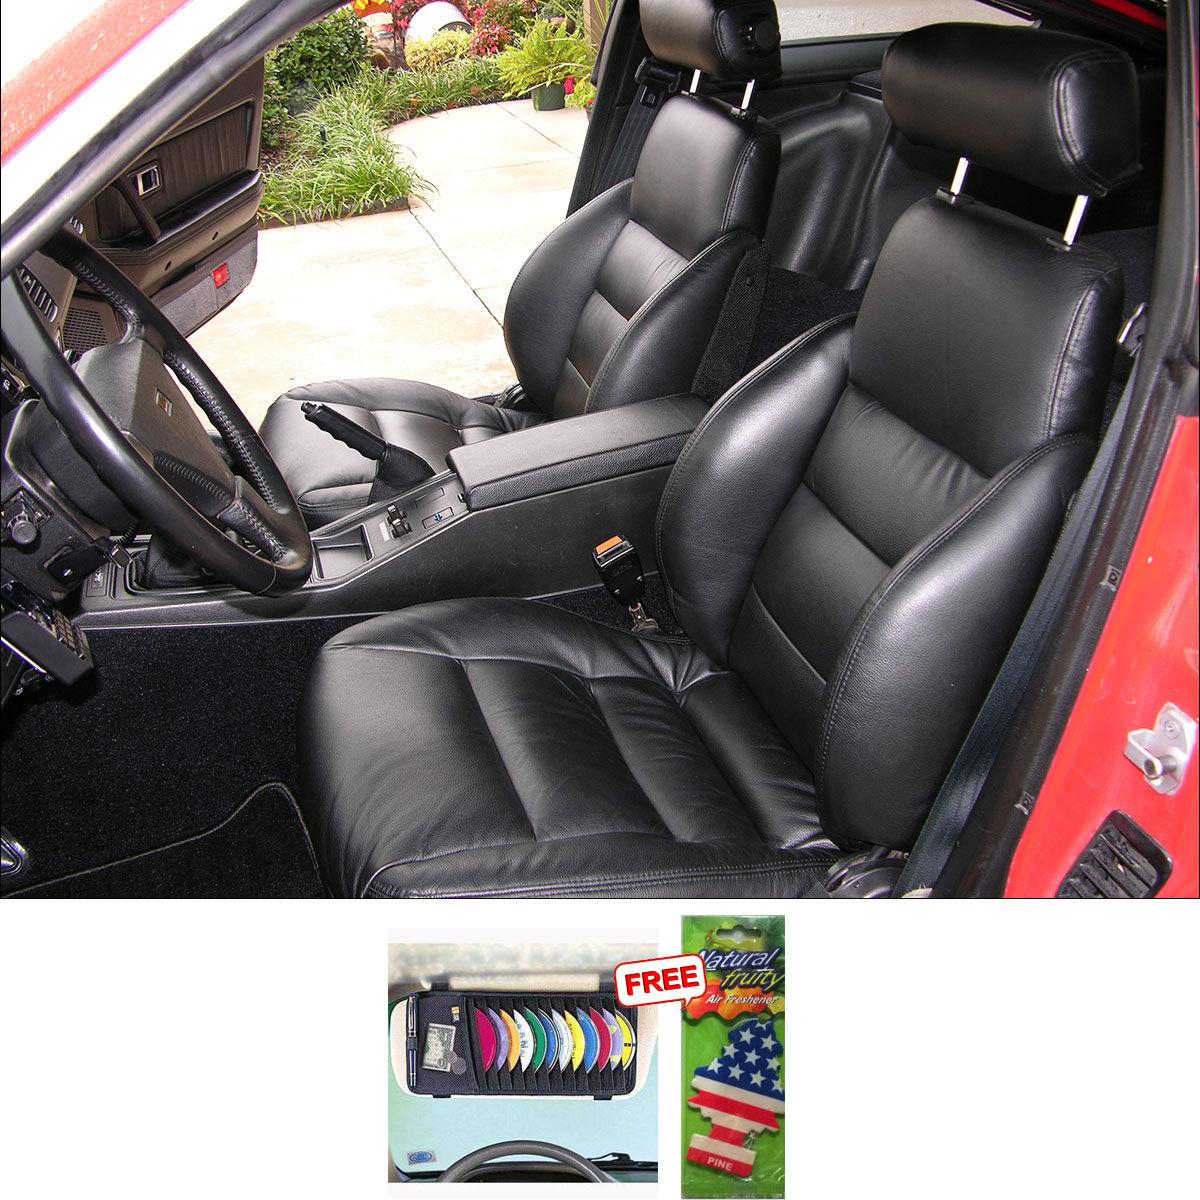 Samsun Car Seat Cover for Ford Figo - Black  sc 1 st  Naaptol & Buy Samsun Car Seat Cover for Ford Figo - Black Online at Best ... markmcfarlin.com